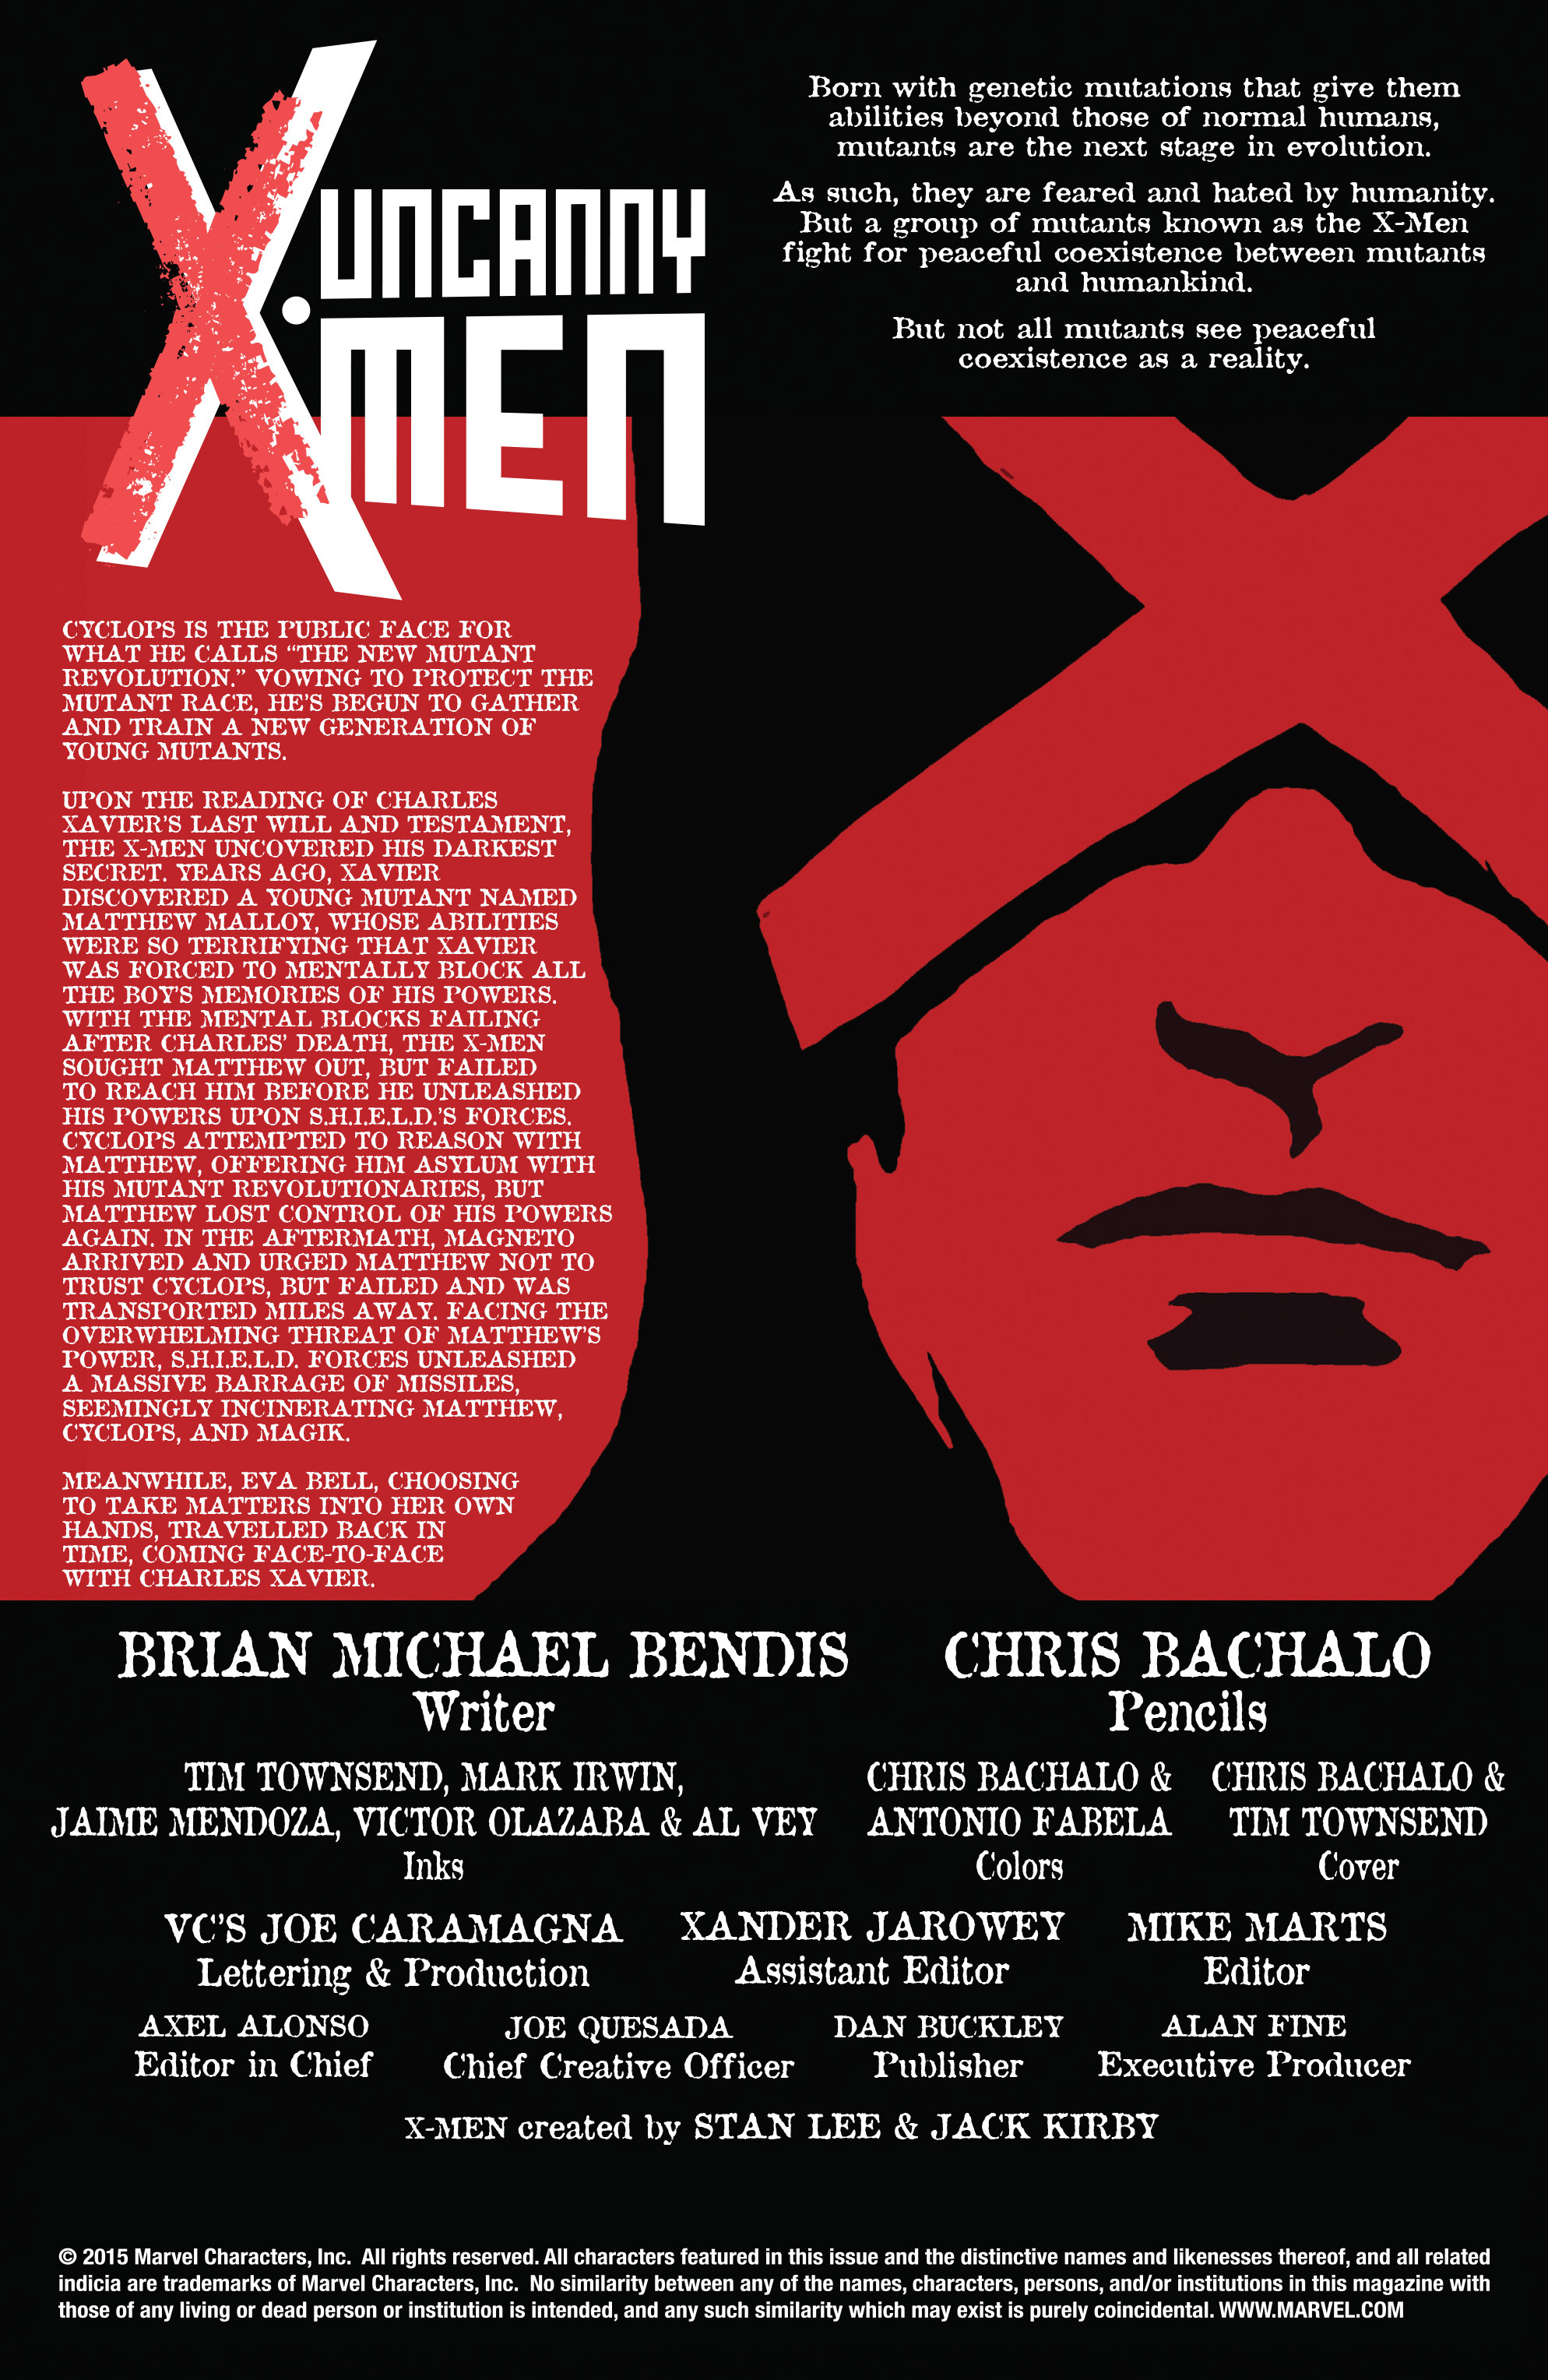 Read online Uncanny X-Men (2013) comic -  Issue # _TPB 5 - The Omega Mutant - 77